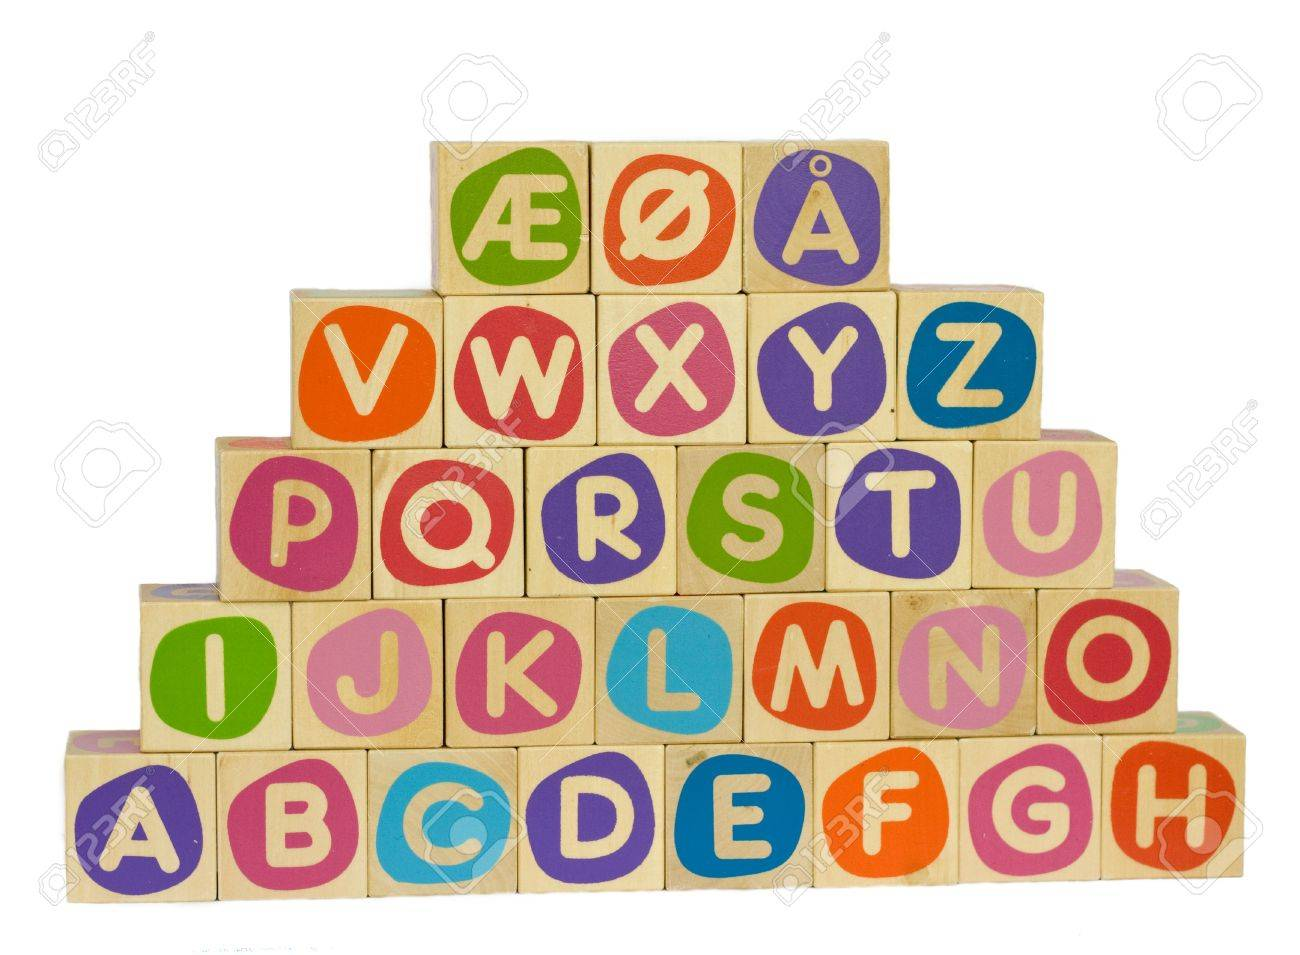 Alphabet blocks with the three special scandinavian symbols for alphabet blocks with the three special scandinavian symbols for the vowels ae oe and aa buycottarizona